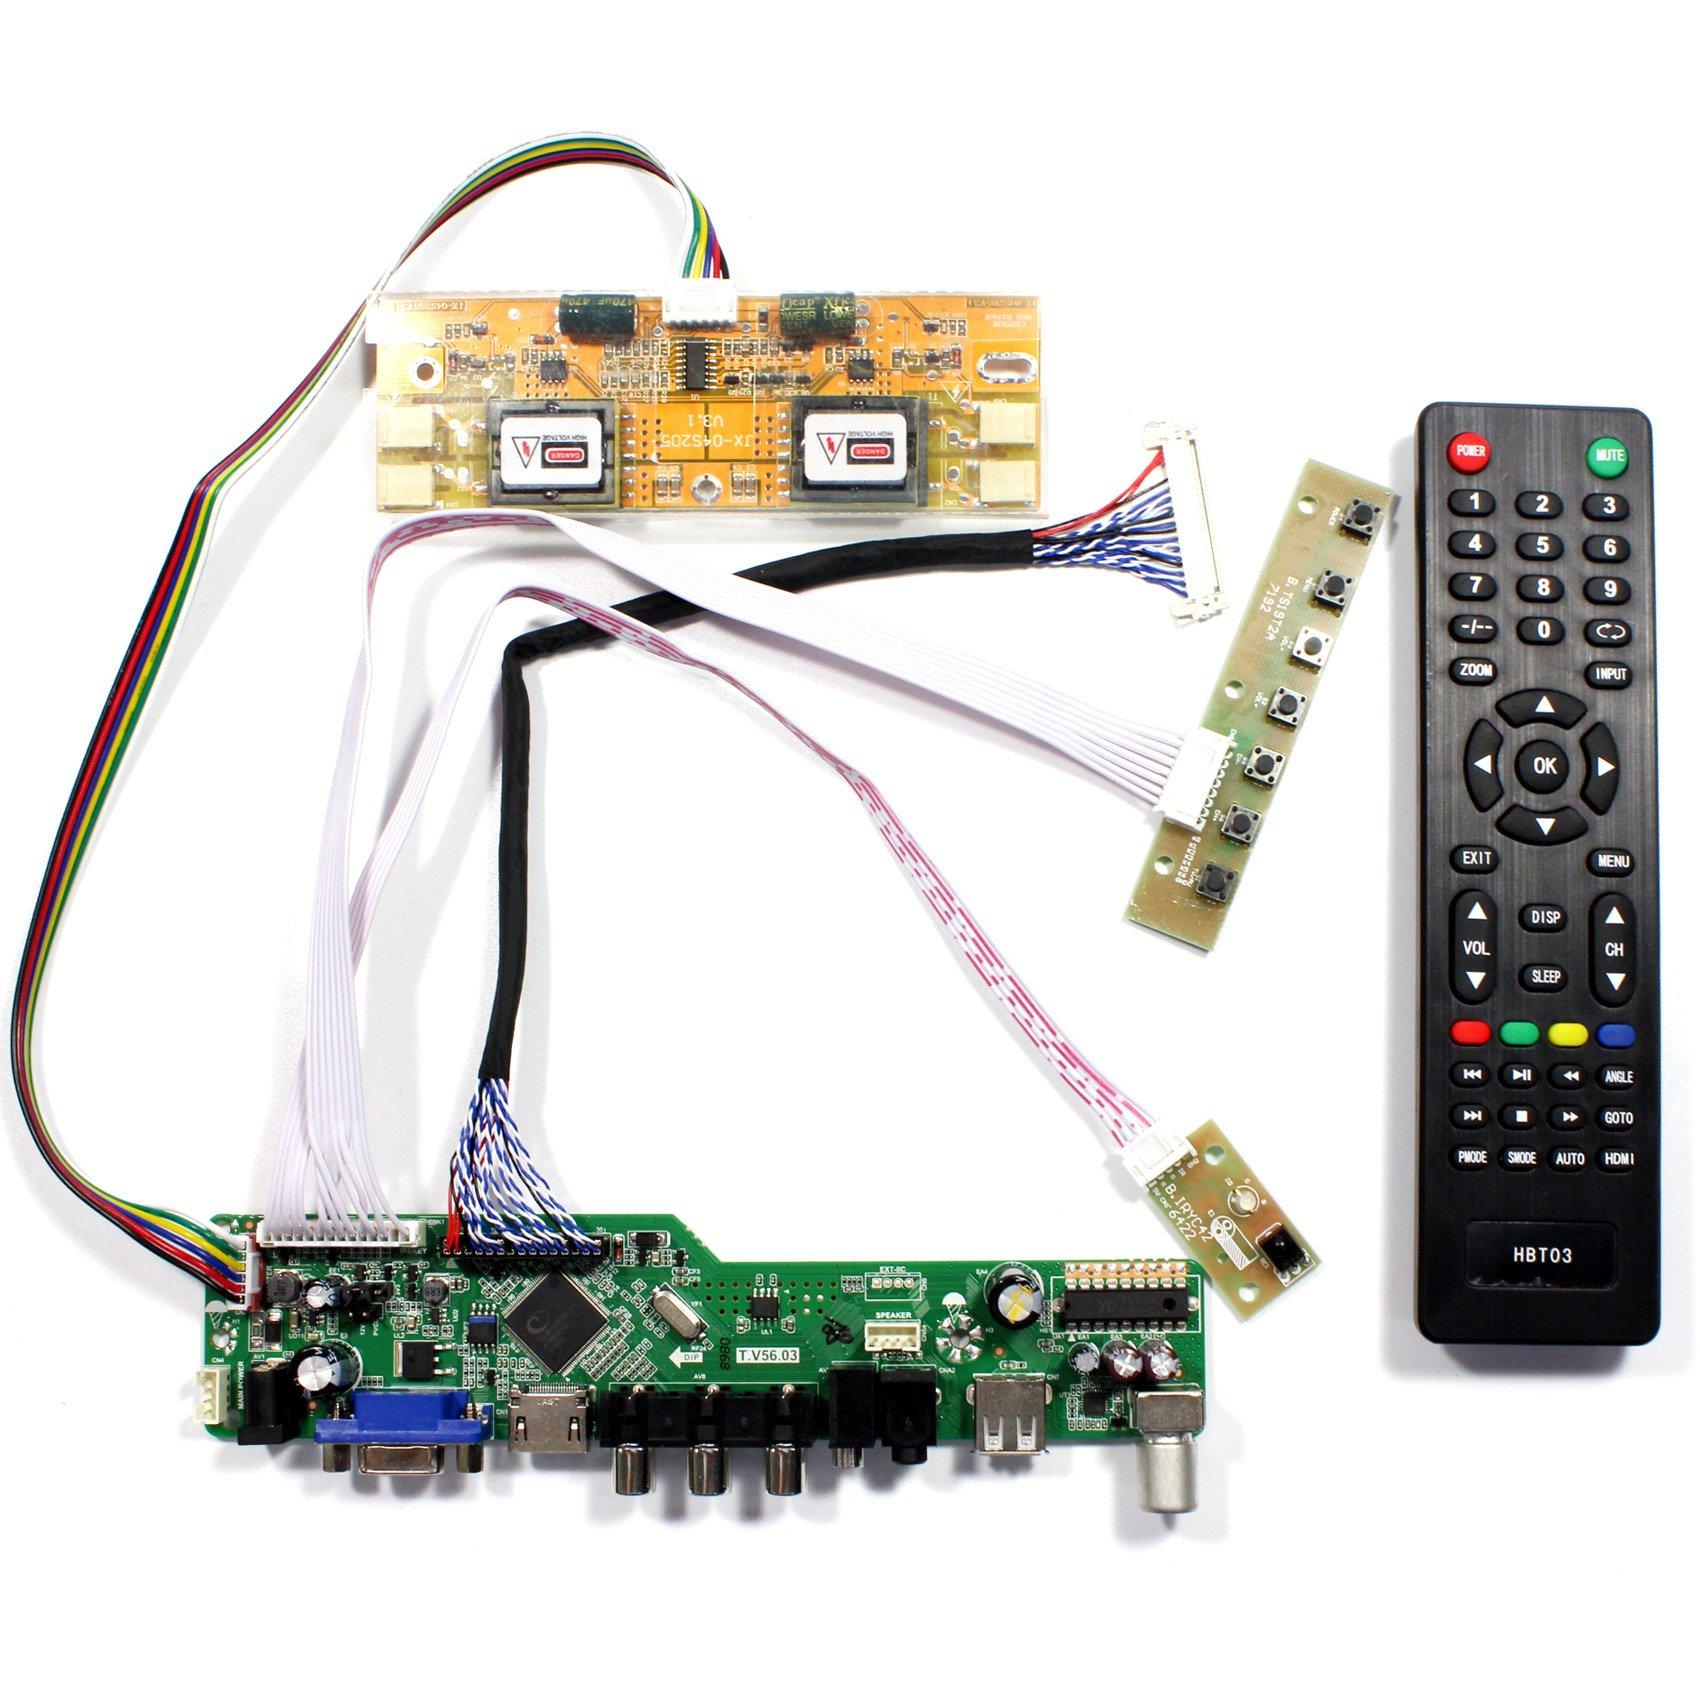 Controladora LCD HDMI VGA 20.1 22 1680x1050 M201EW02 LTM220M